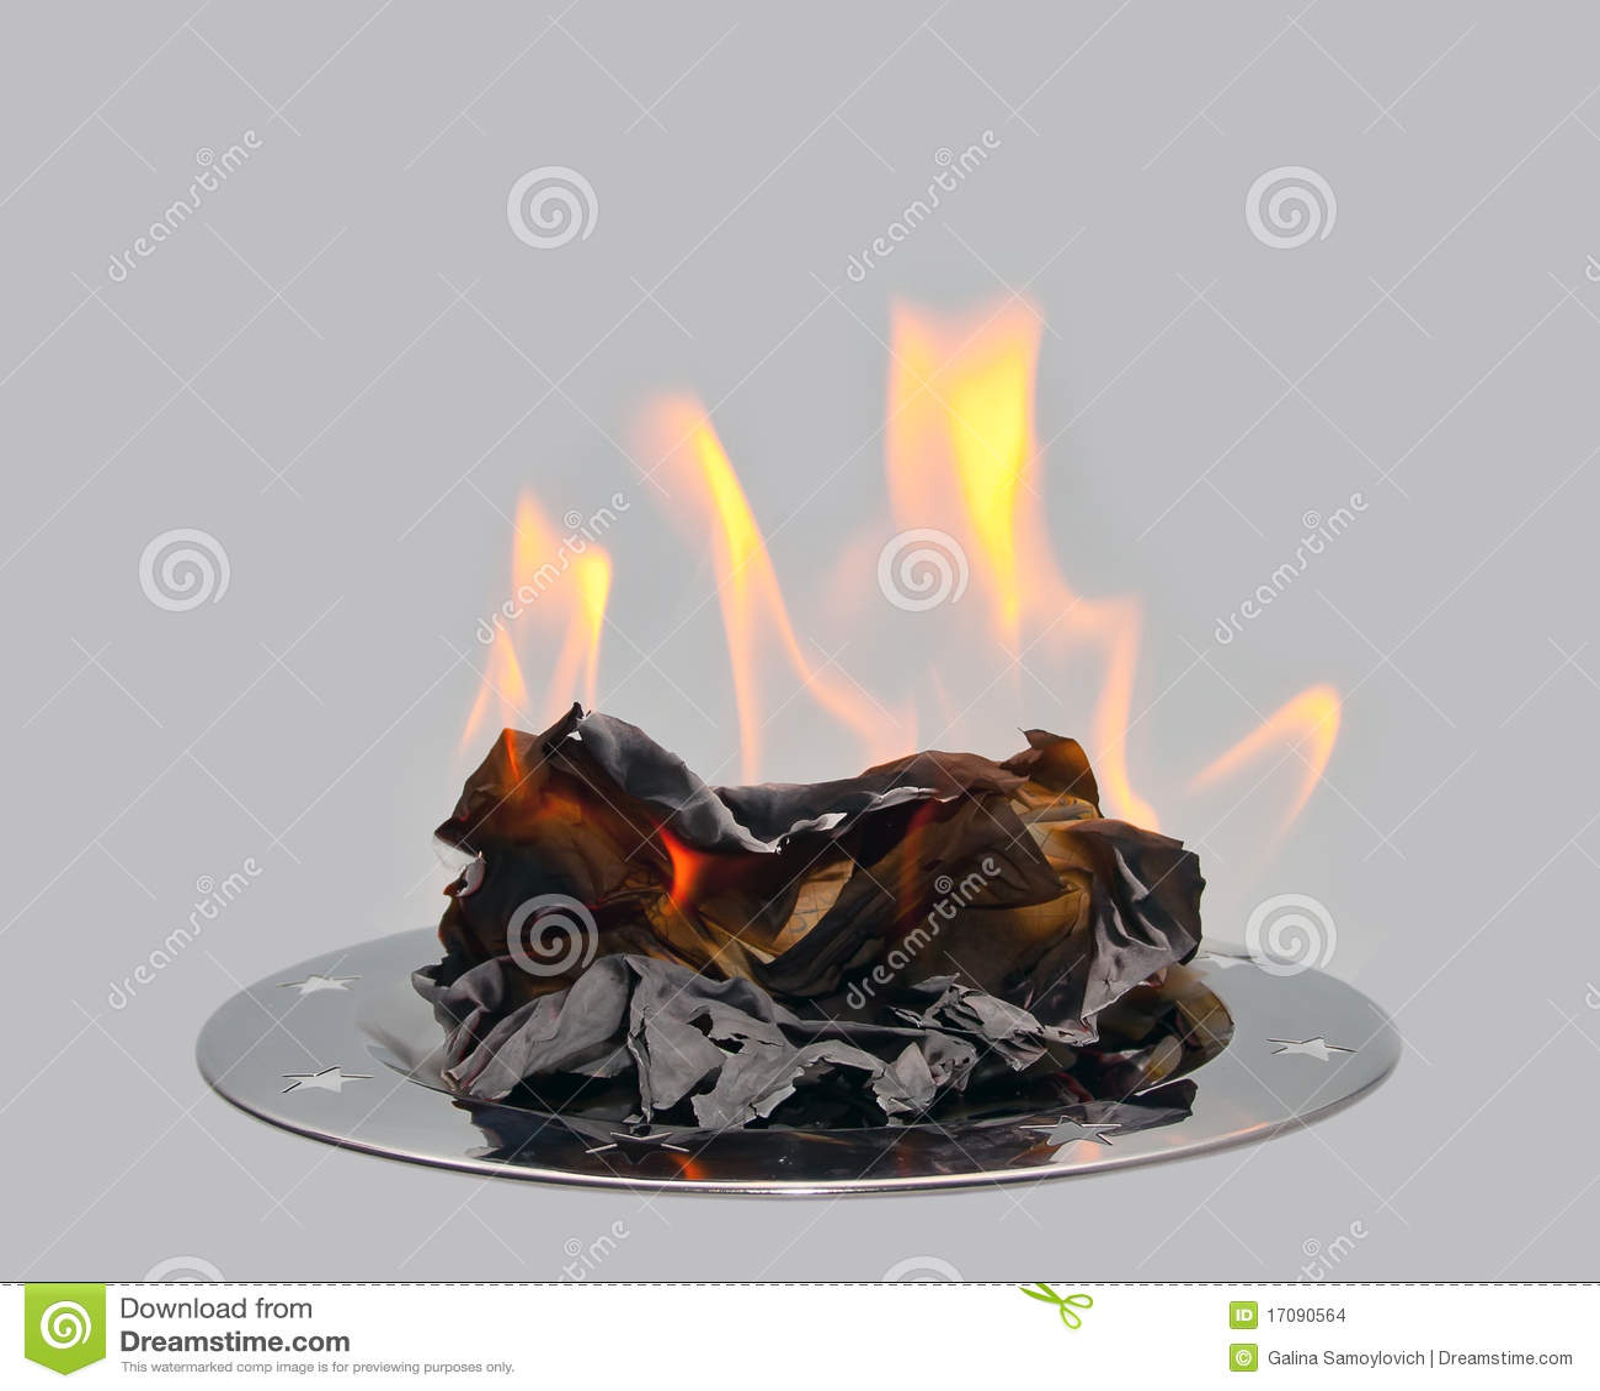 горящая бумага